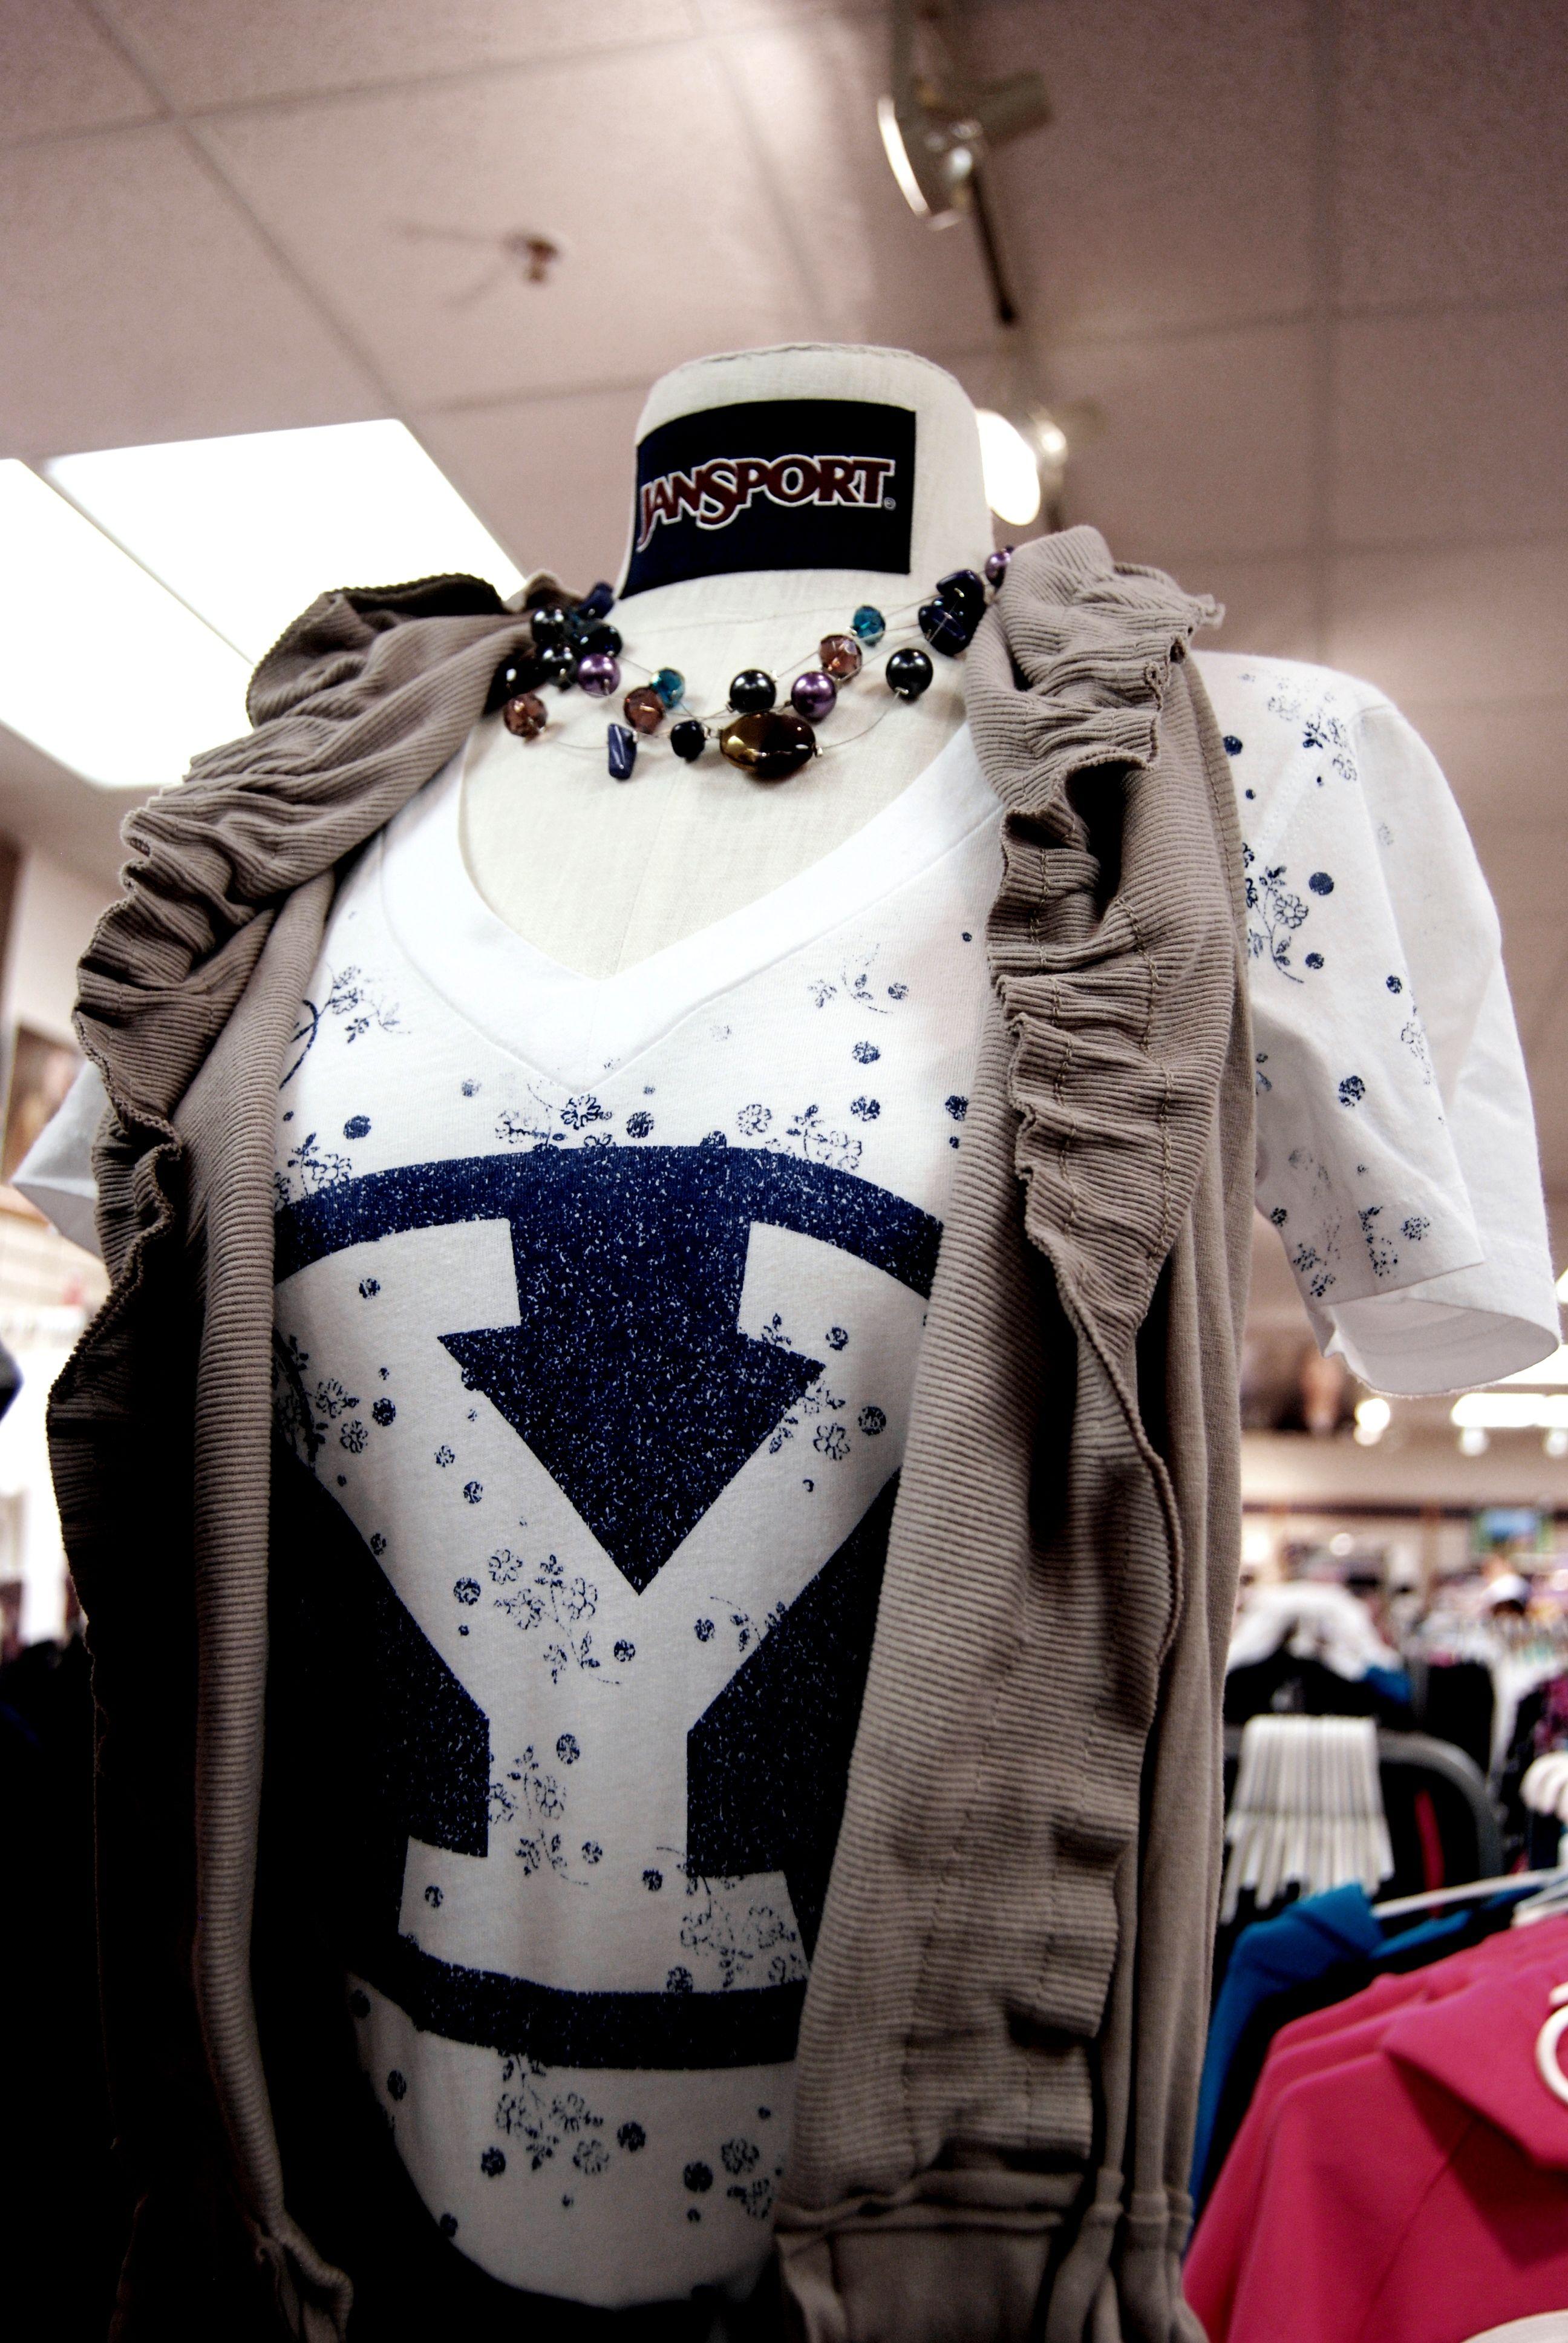 You Know Byu Rocks Mormonlink Lds Byu Byu Lds Byusports Cool Outfits Byu Football Byu Sports